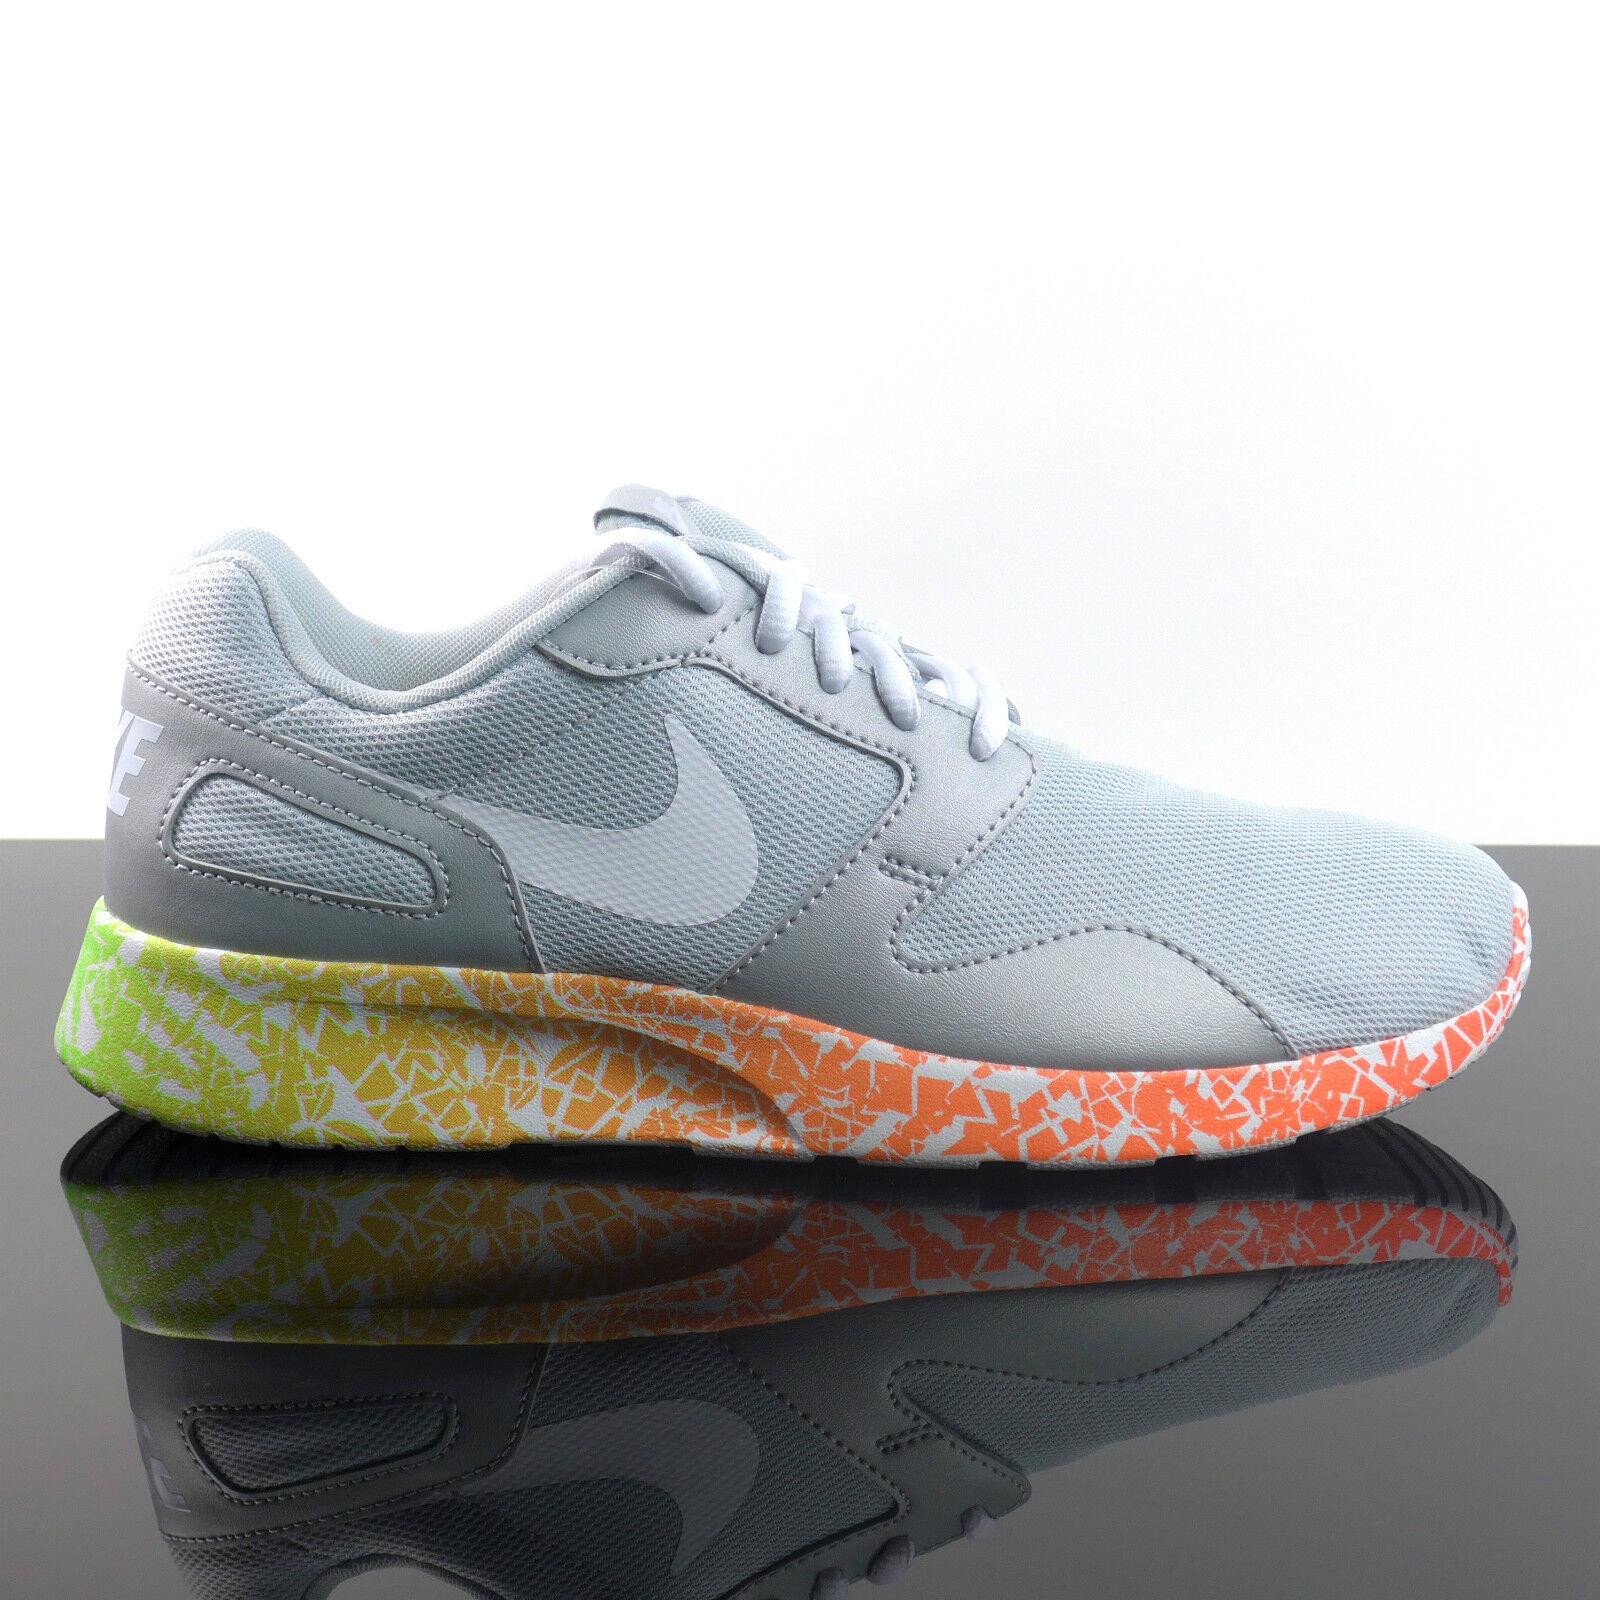 Zapatos Mujer Nike Kaishi estampado Roshe Run Zapatillas Sudadera (705374 010)